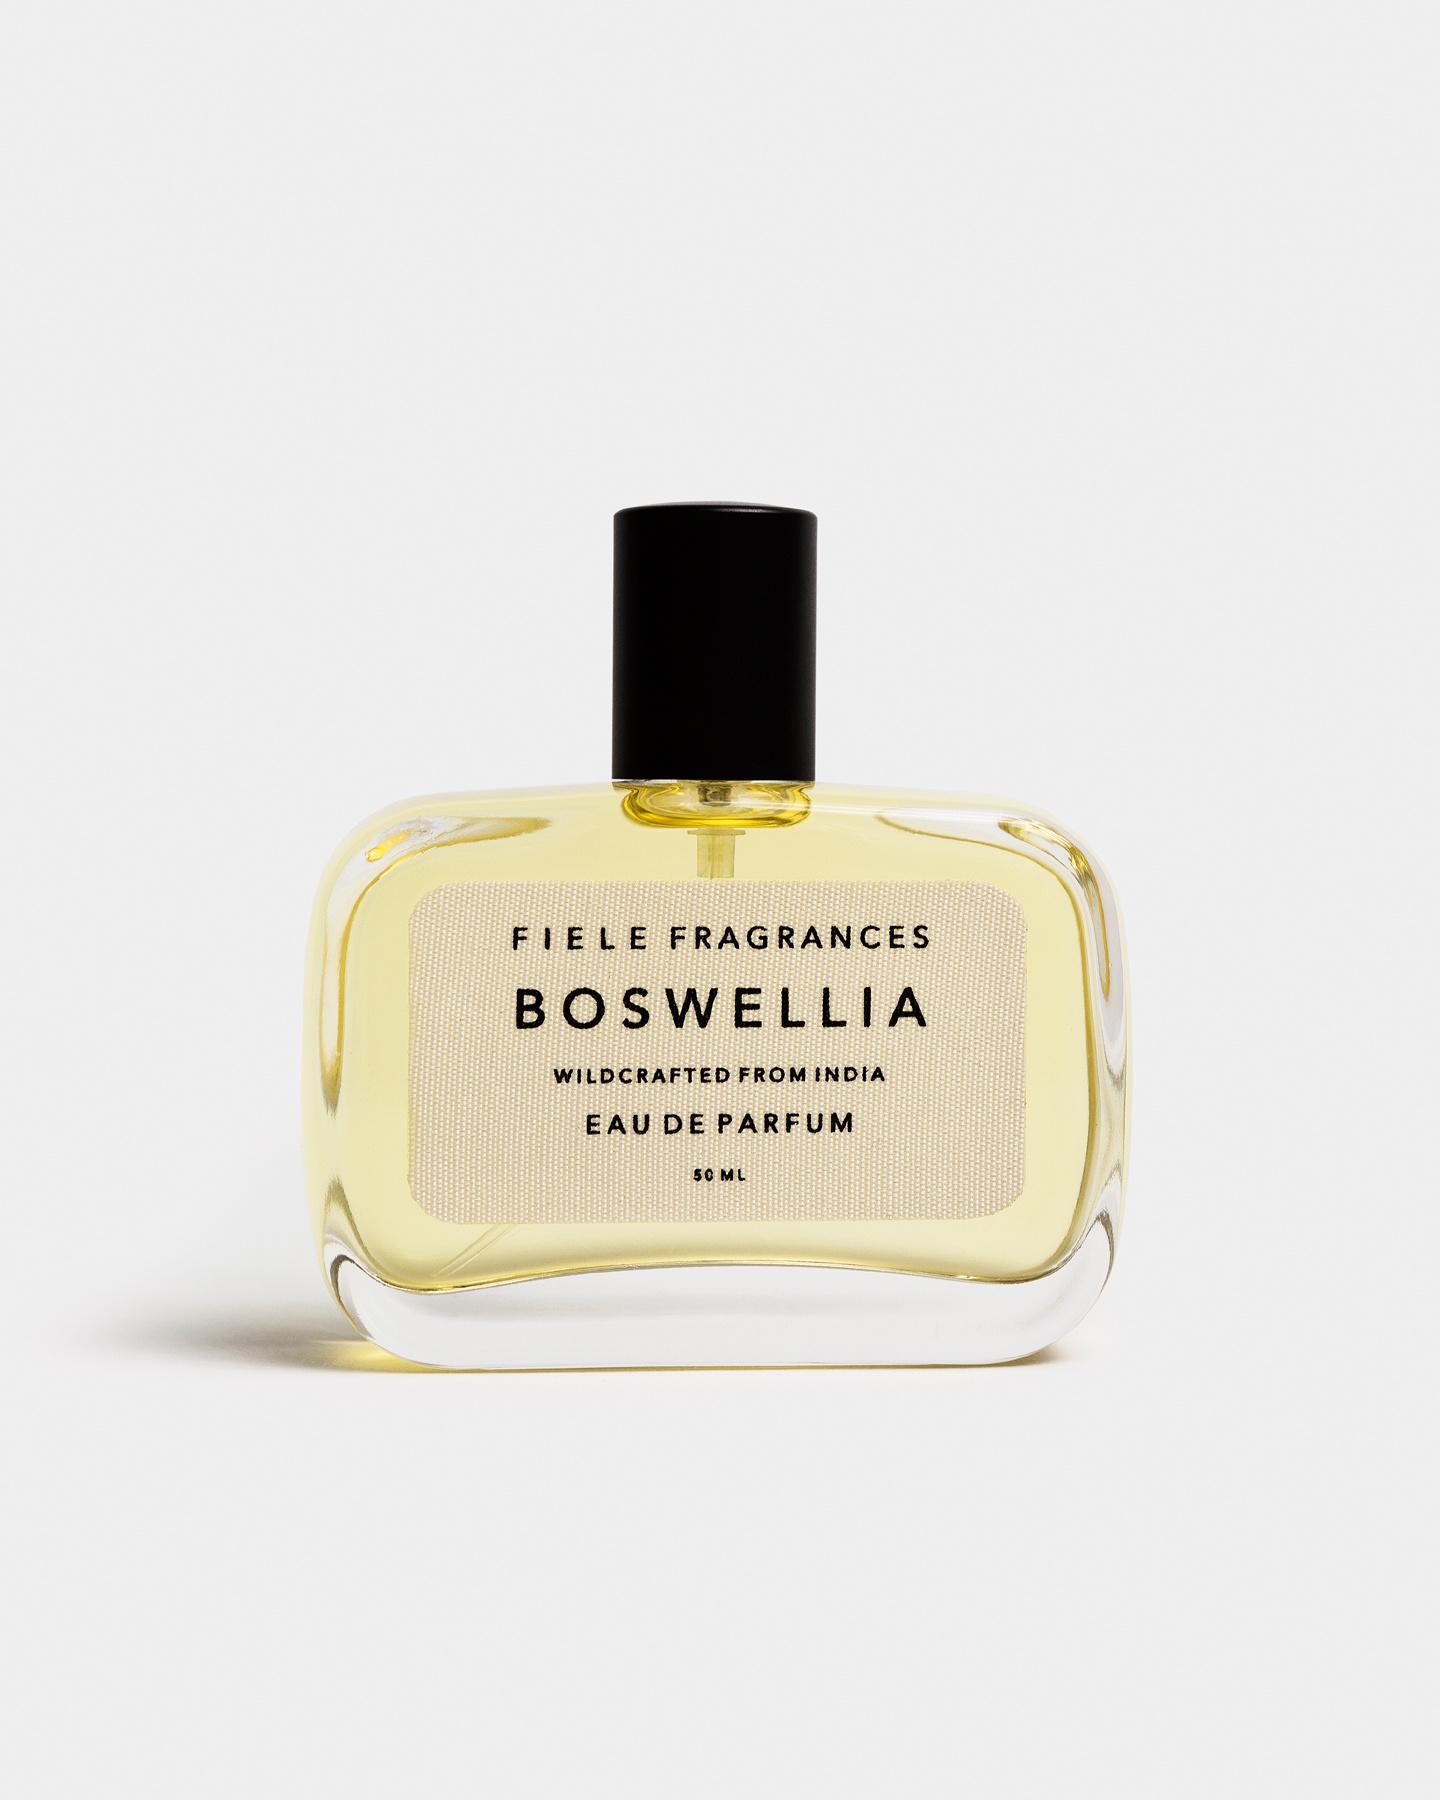 Fiele Fragrances Boswella 50 ml